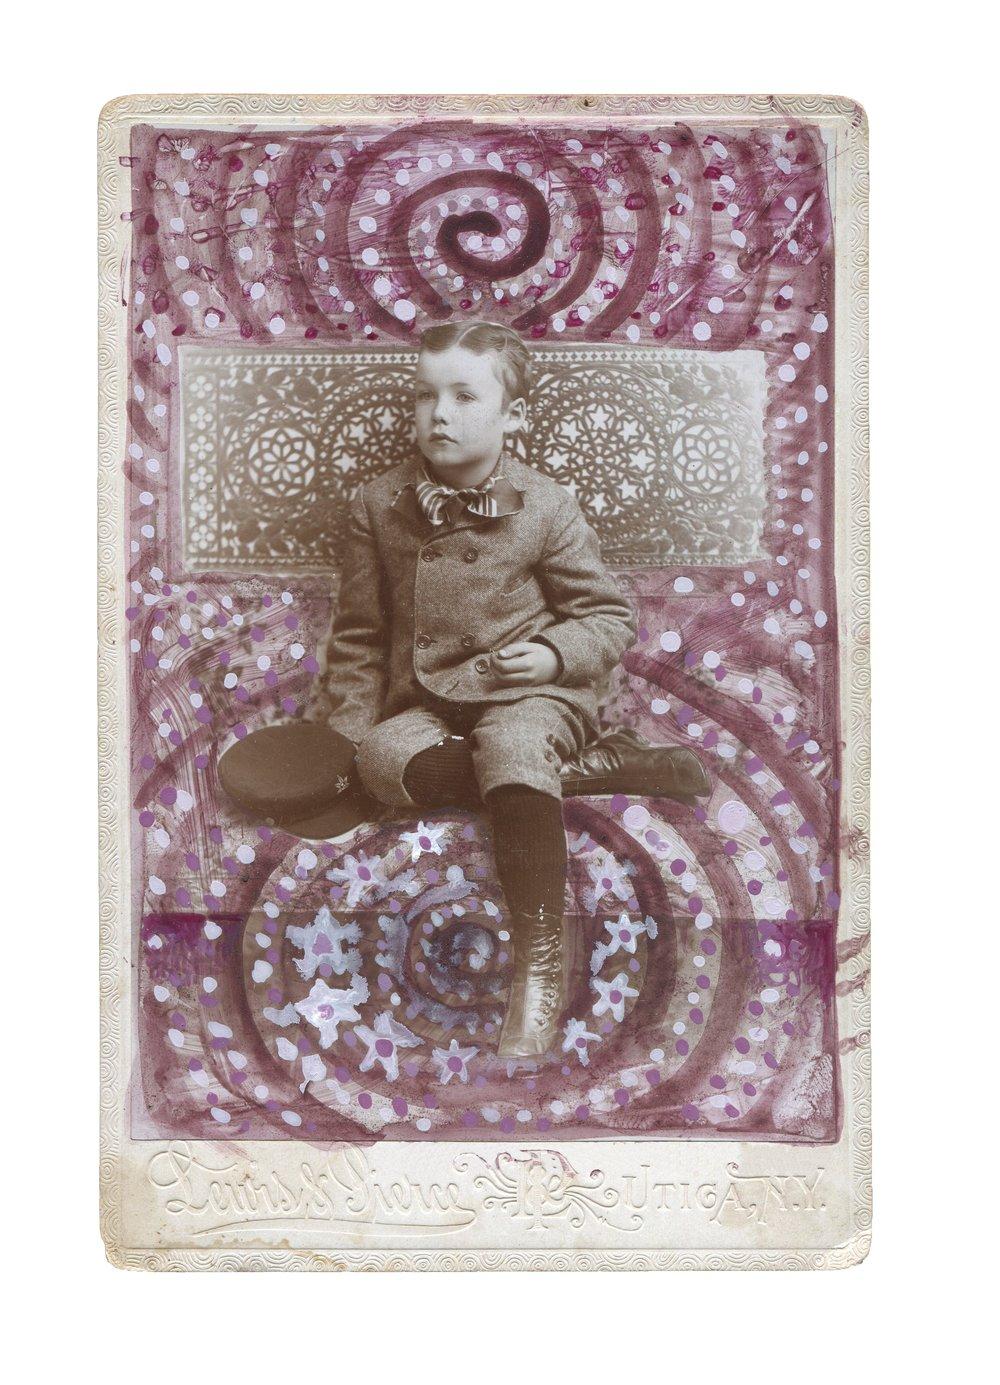 Young Fredrick